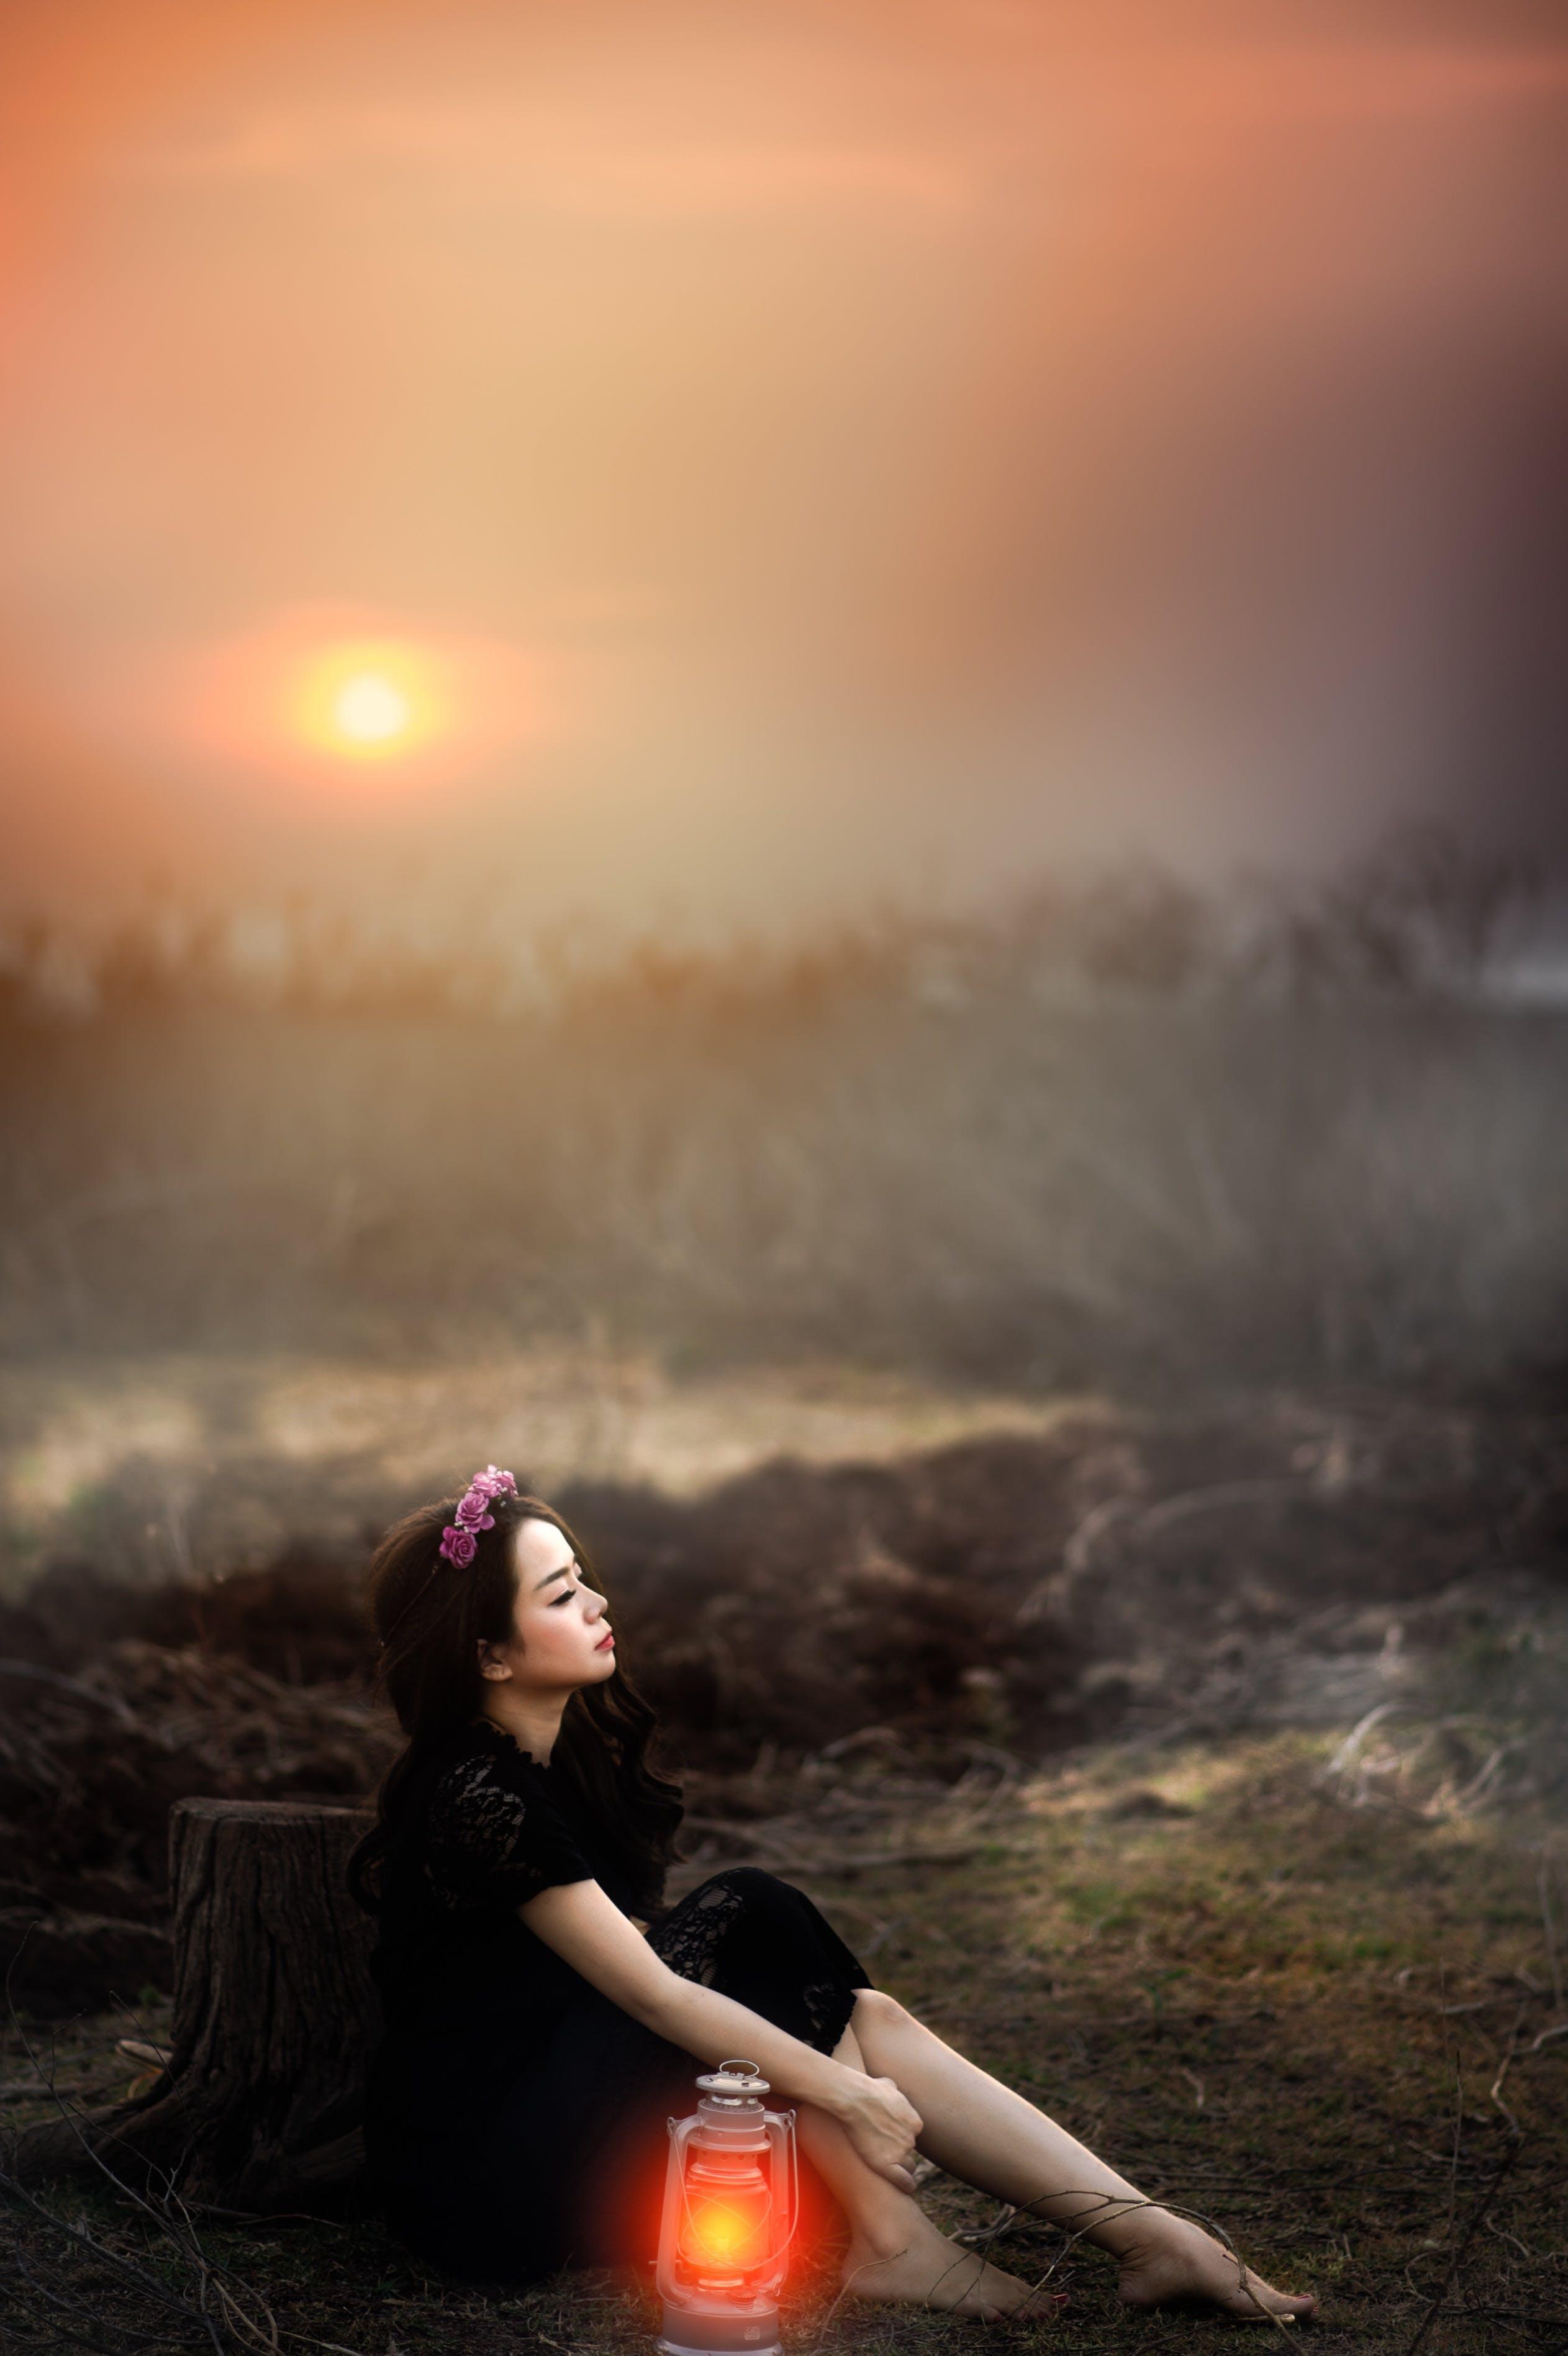 Woman Sitting Beside Lit Lantern